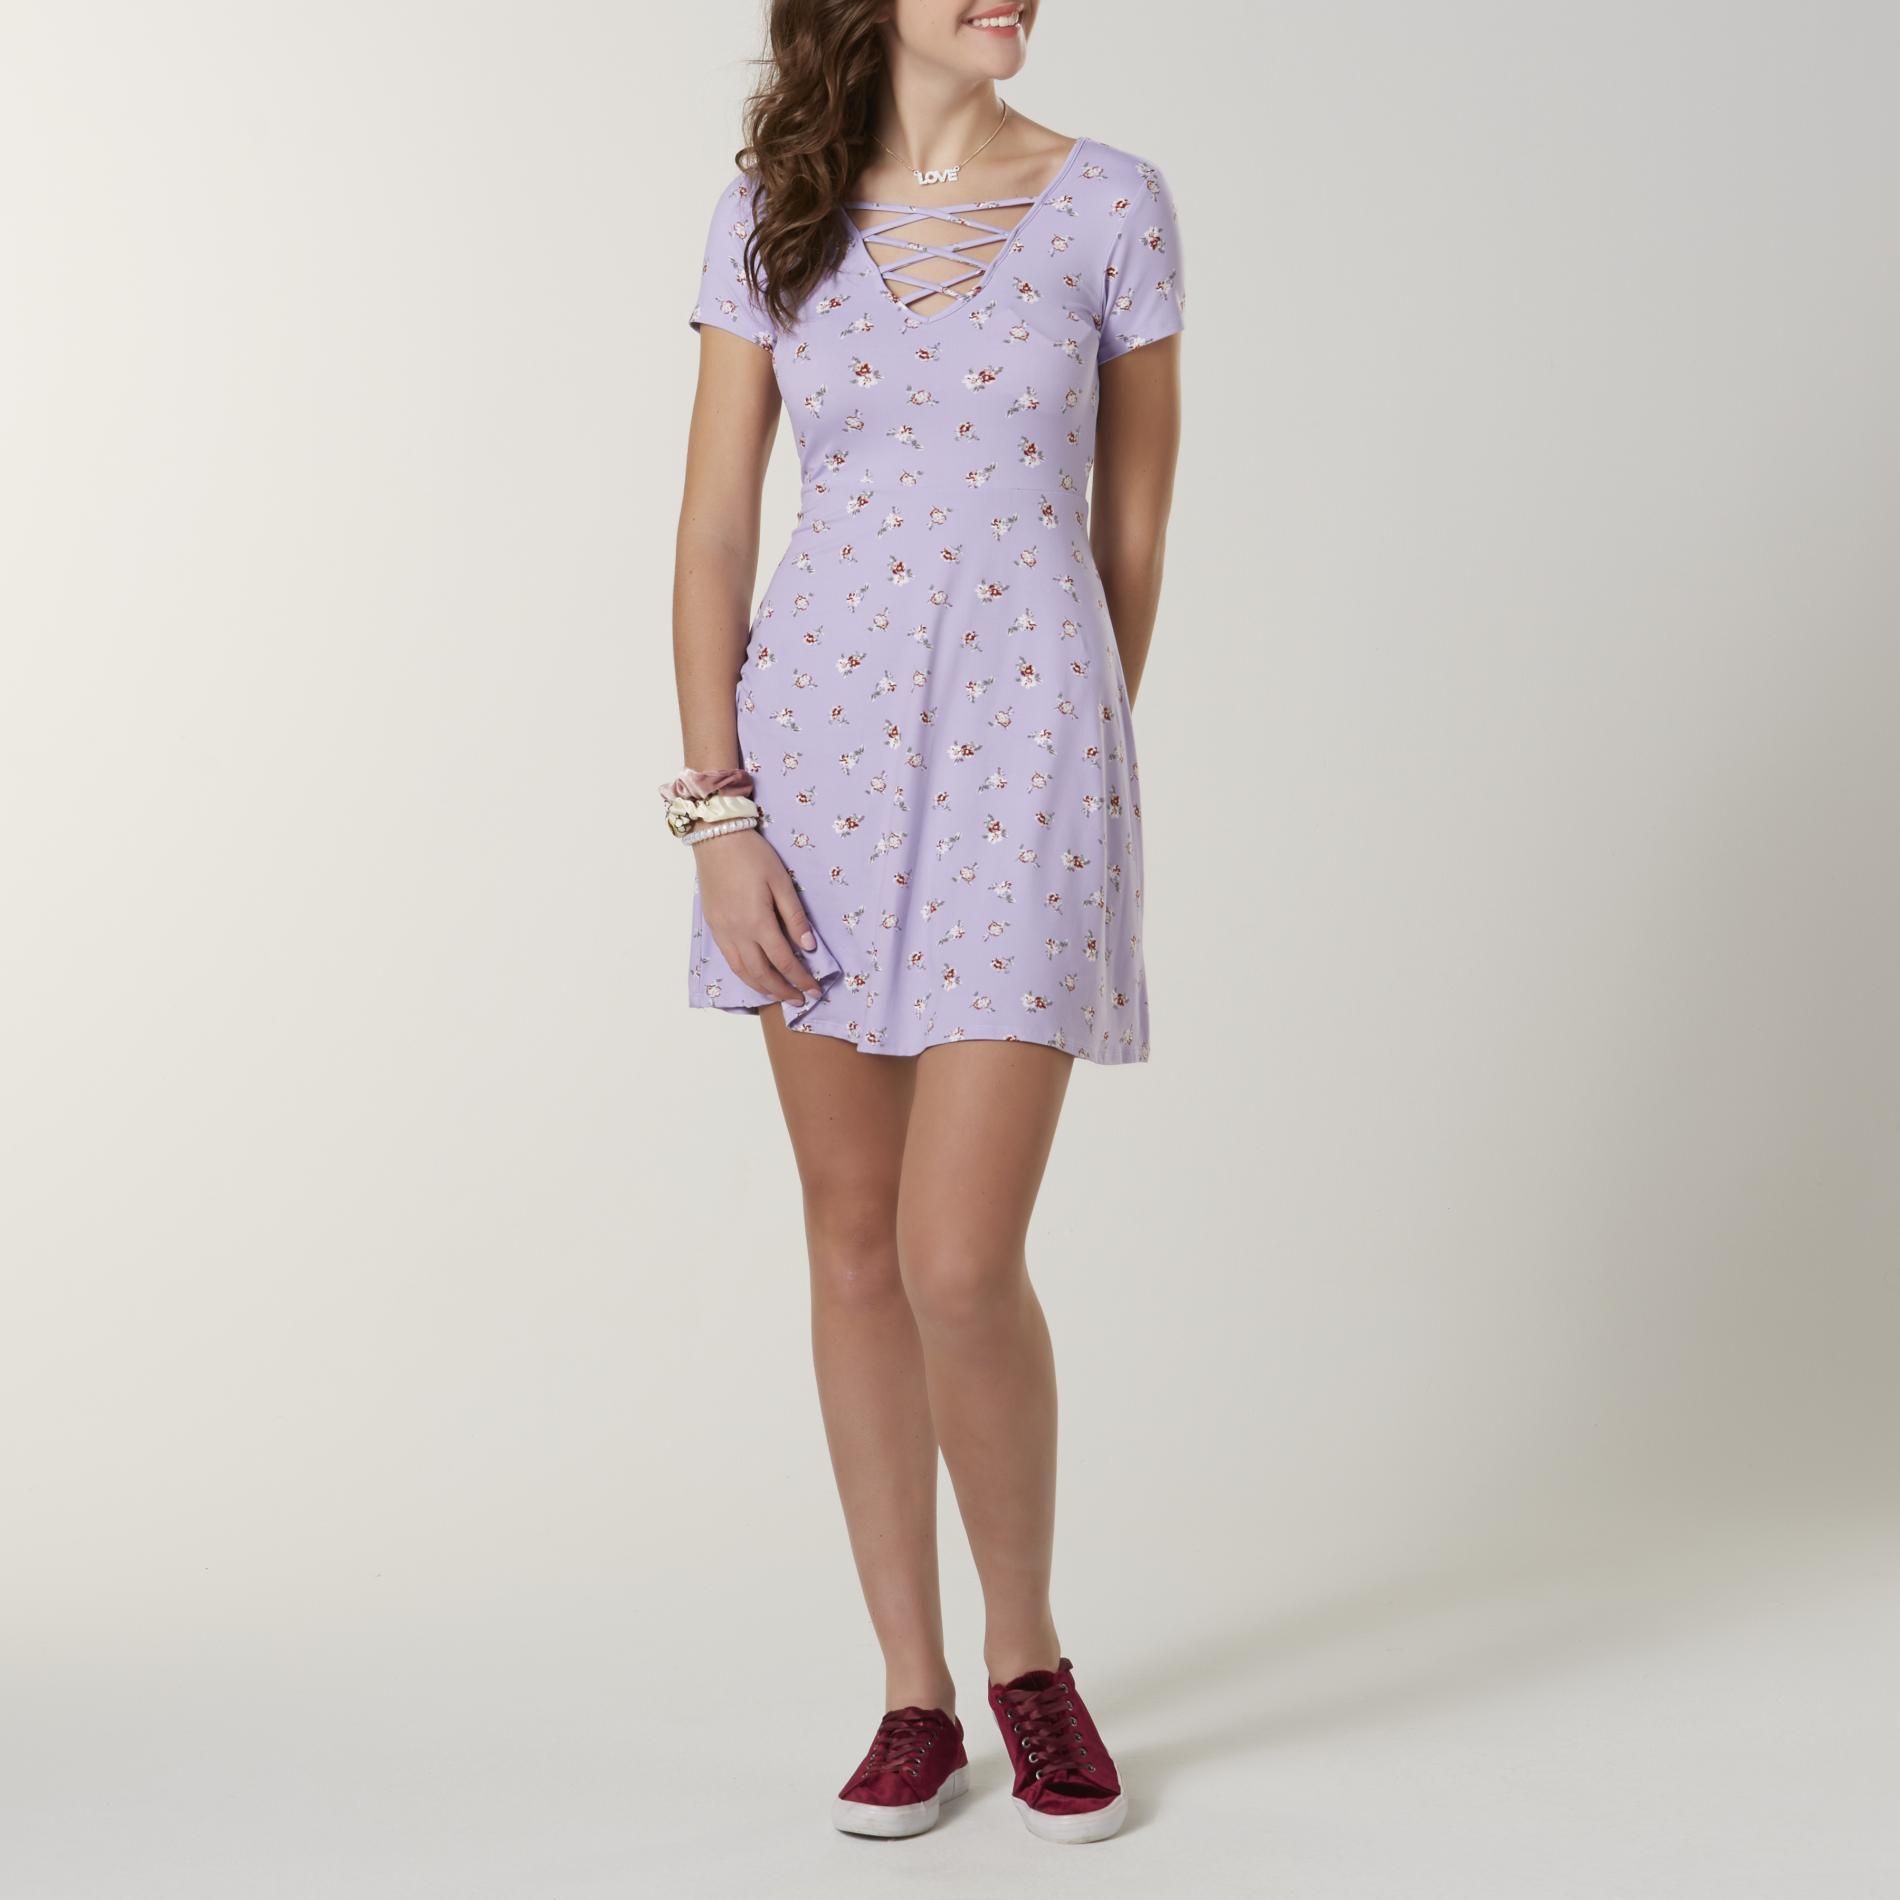 Joe Boxer Juniors' Skater Dress - Floral, Size: Small, Pastel Purple